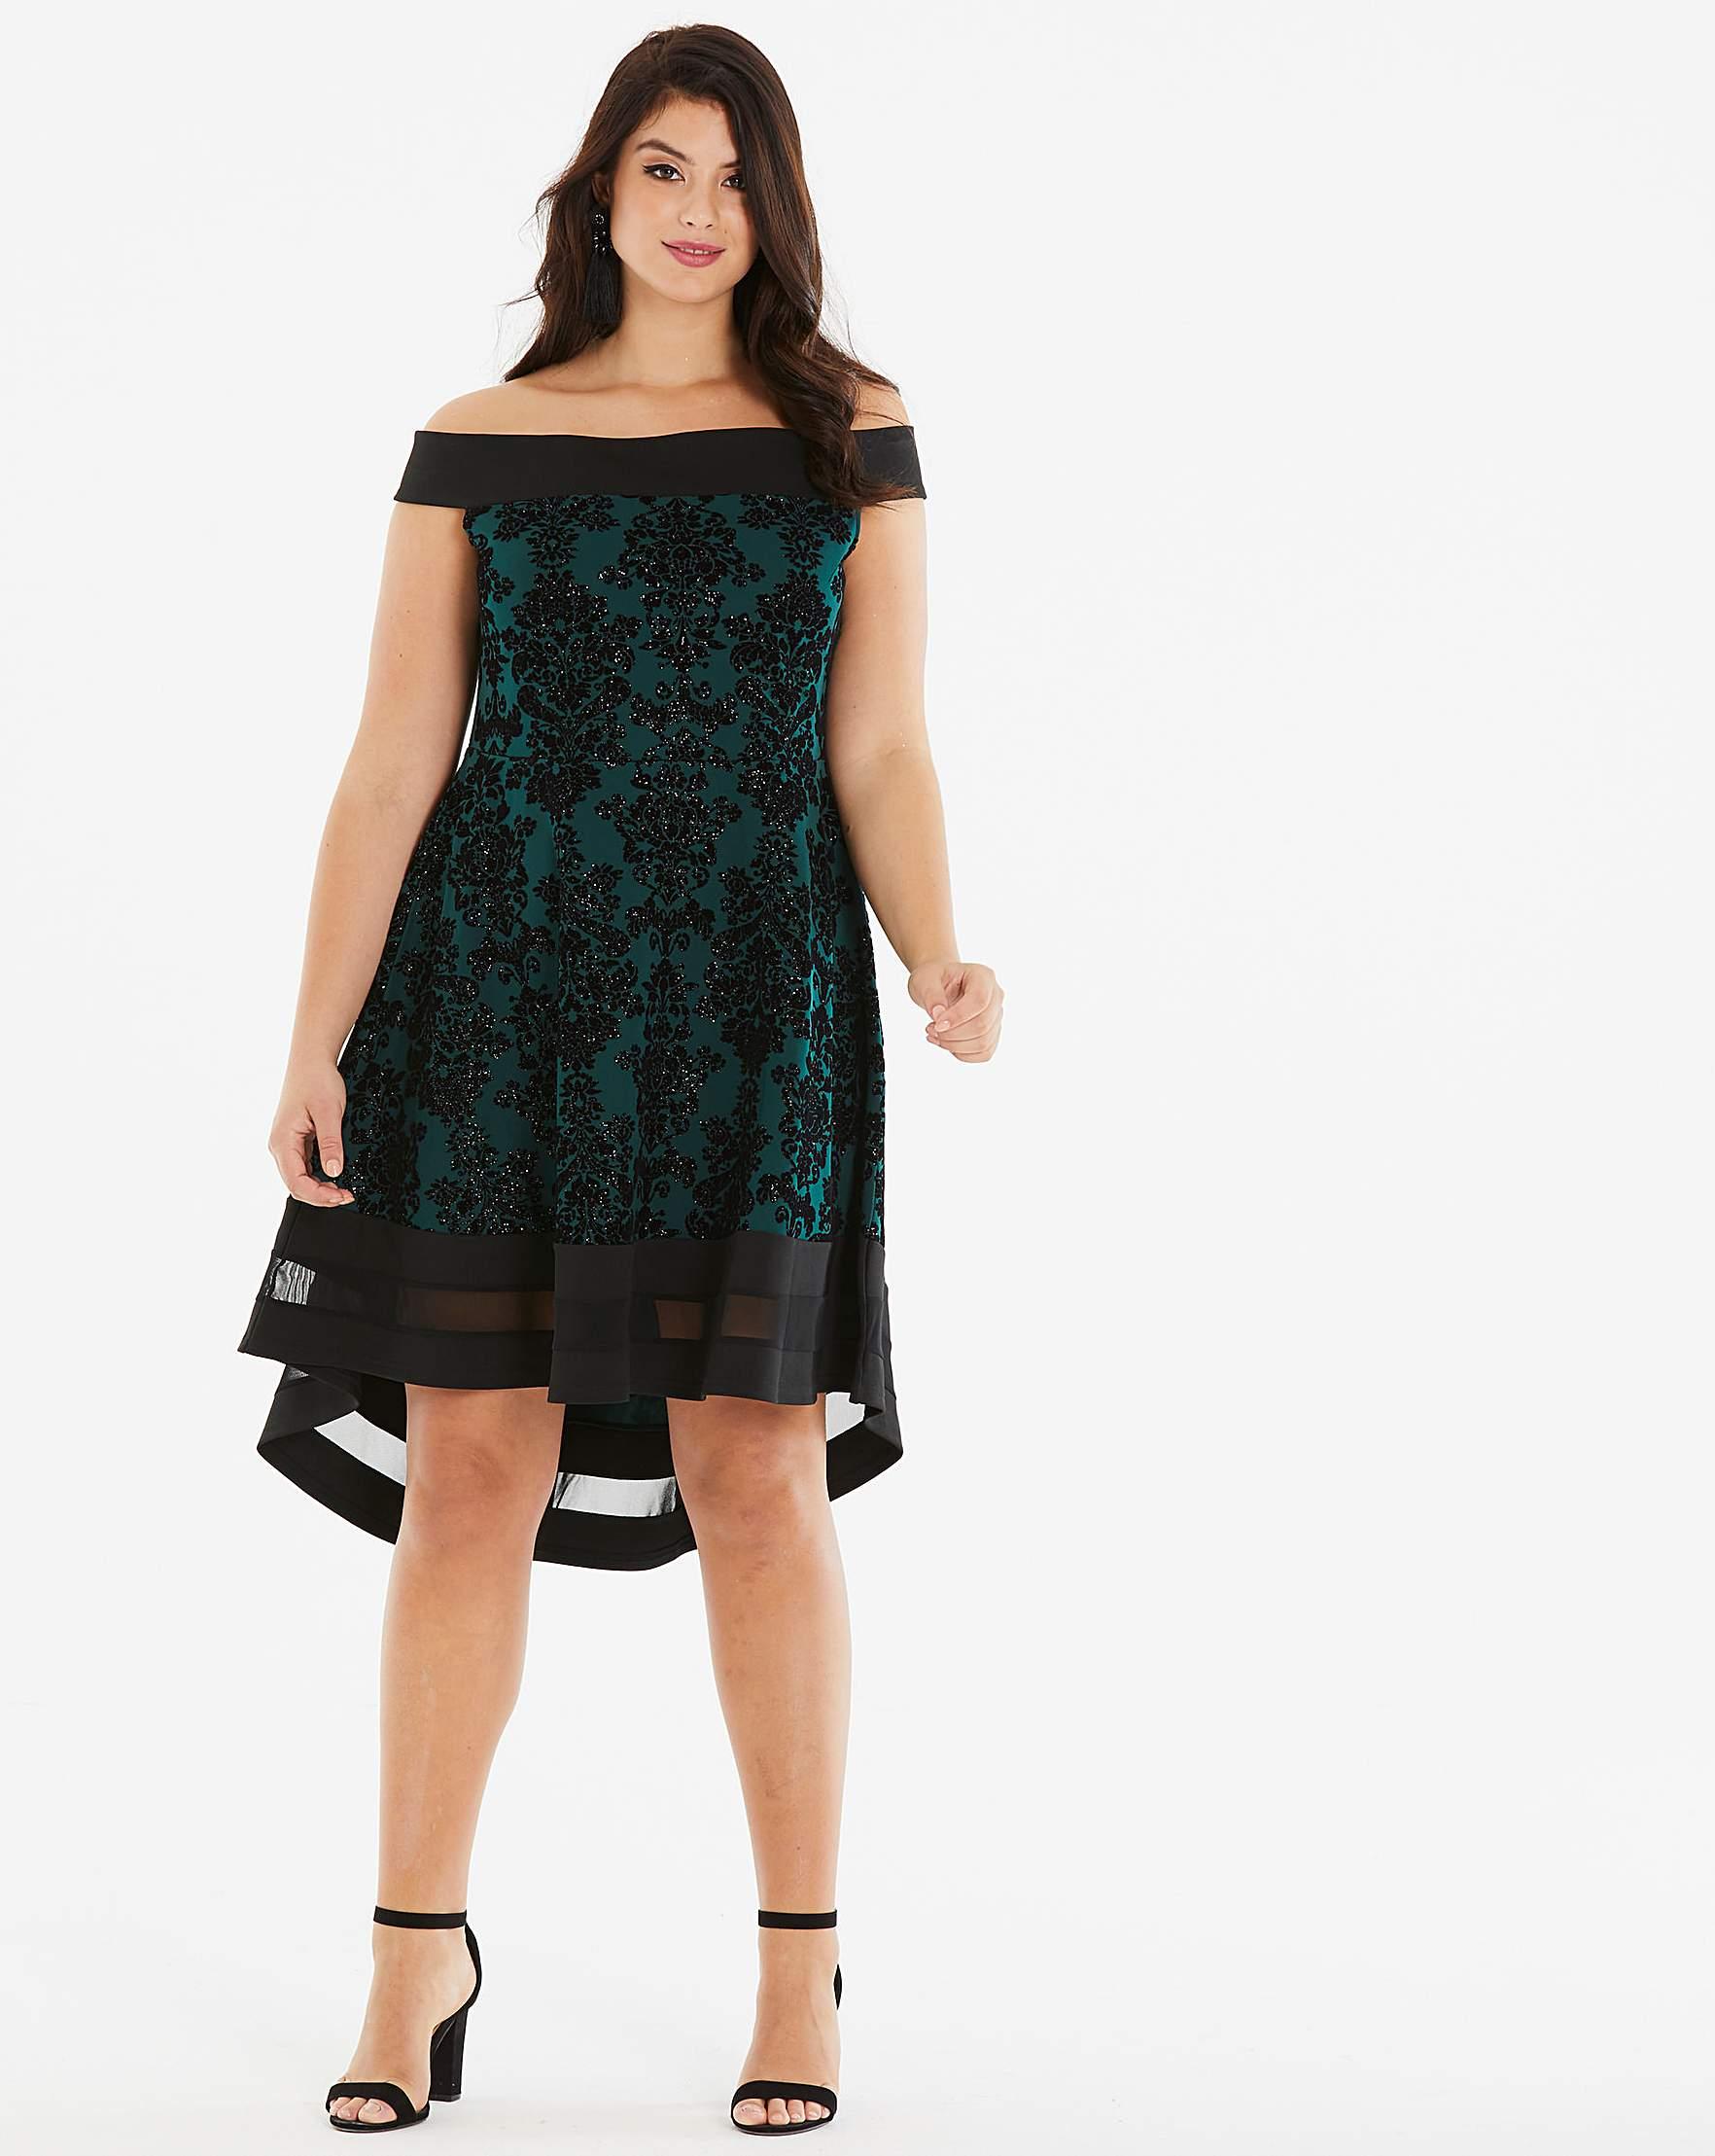 NEW QUIZ Navy Aqua And Red Floral Print Bardot Dress STUNNING 10 12 14